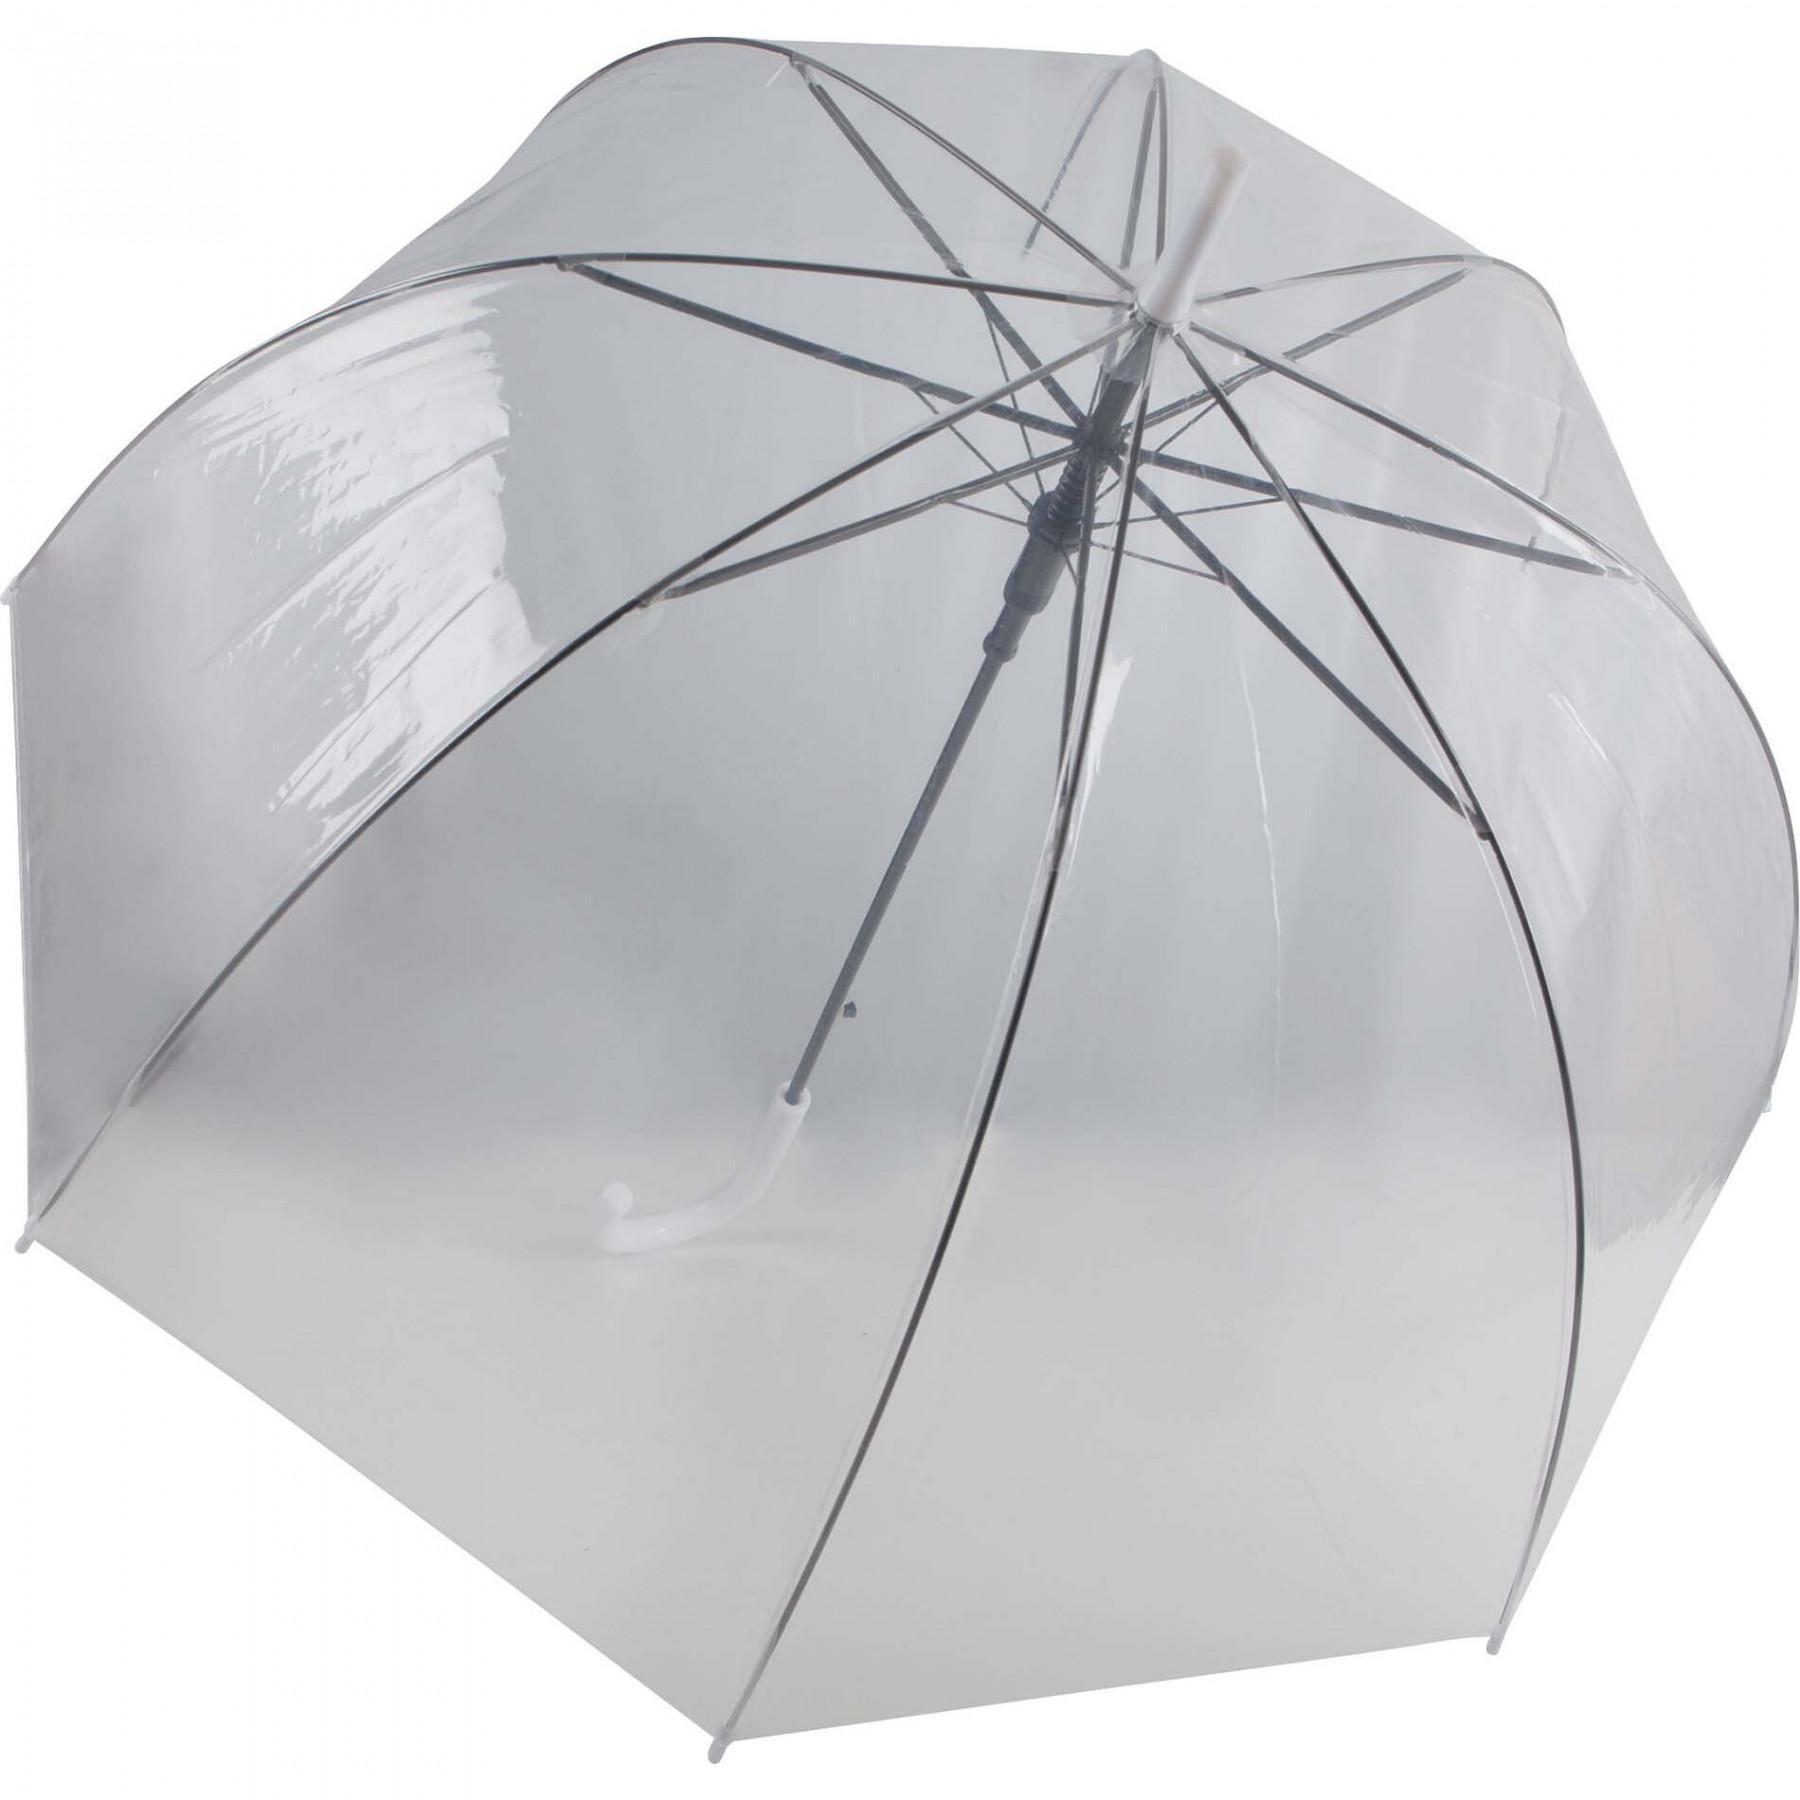 Umbrella Klmood Transparent